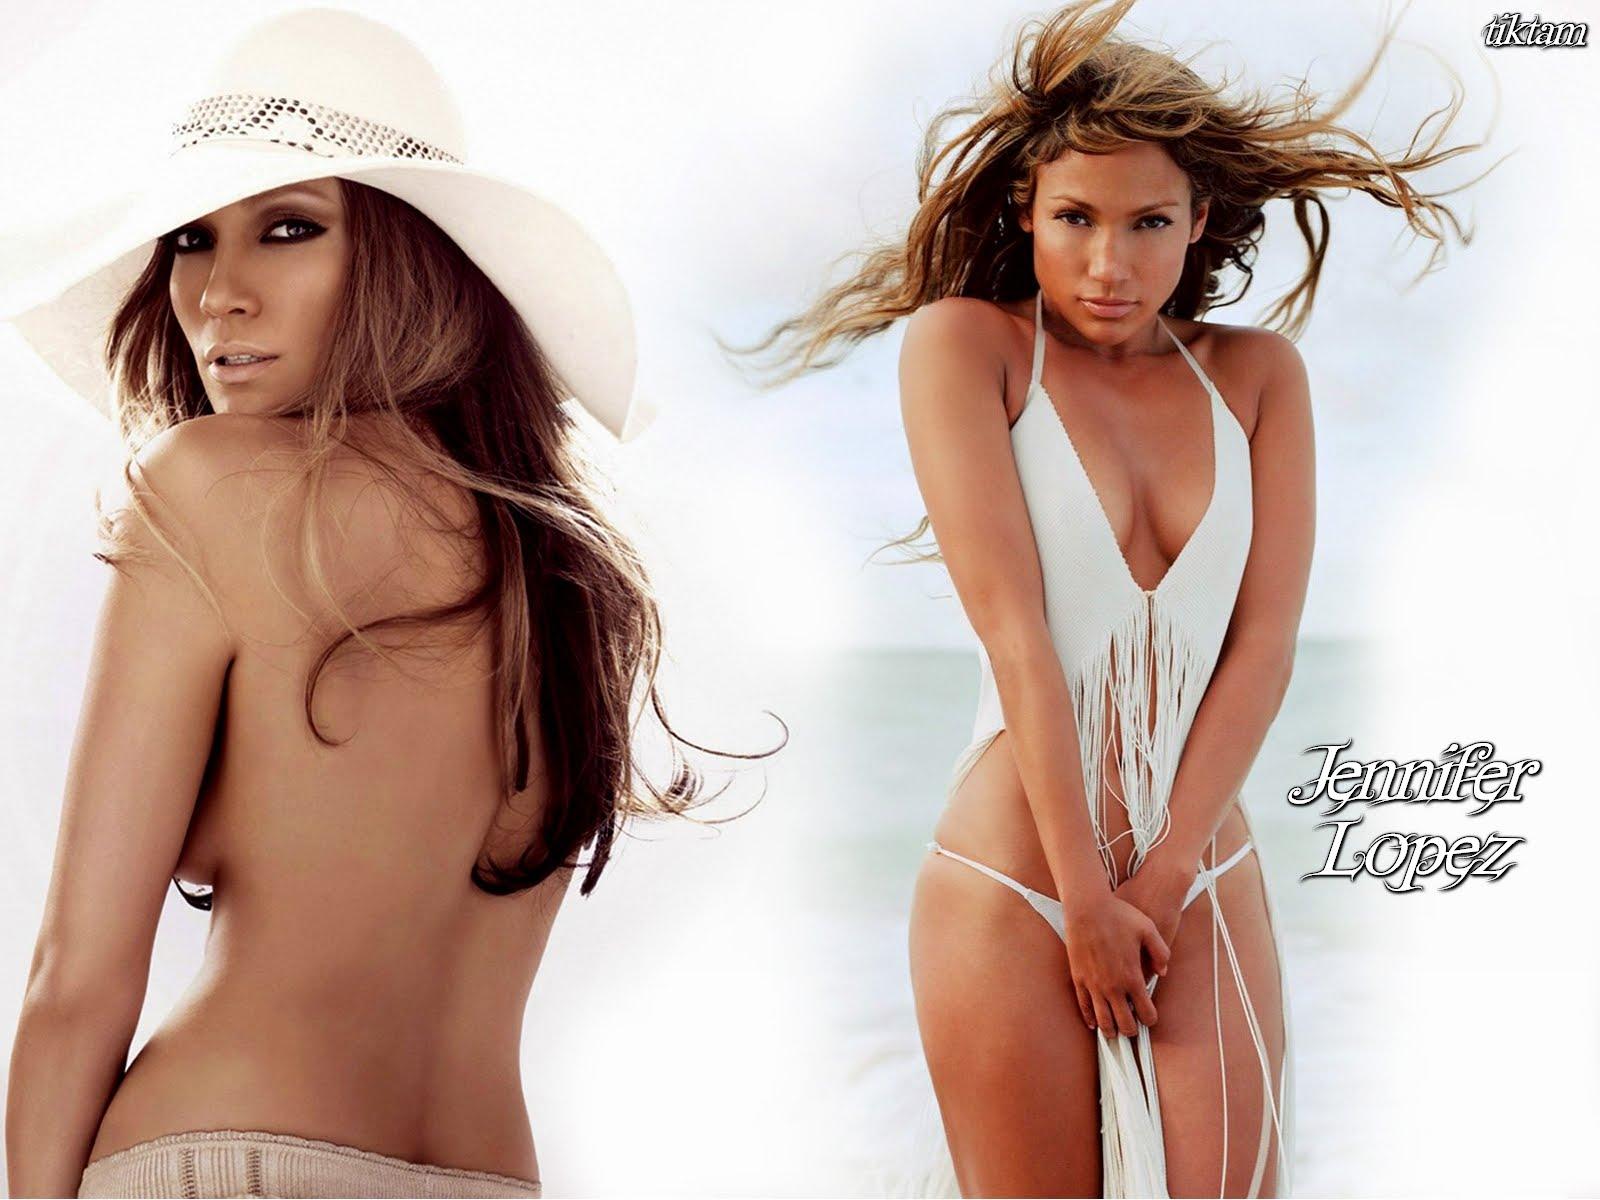 http://2.bp.blogspot.com/_wUgYdGqTOks/S9xXCA6DmtI/AAAAAAAAAVM/8BEl3-L-_JU/s1600/Jennifer-Lopez-jennifer-lopez-43913_1600_1200.jpg